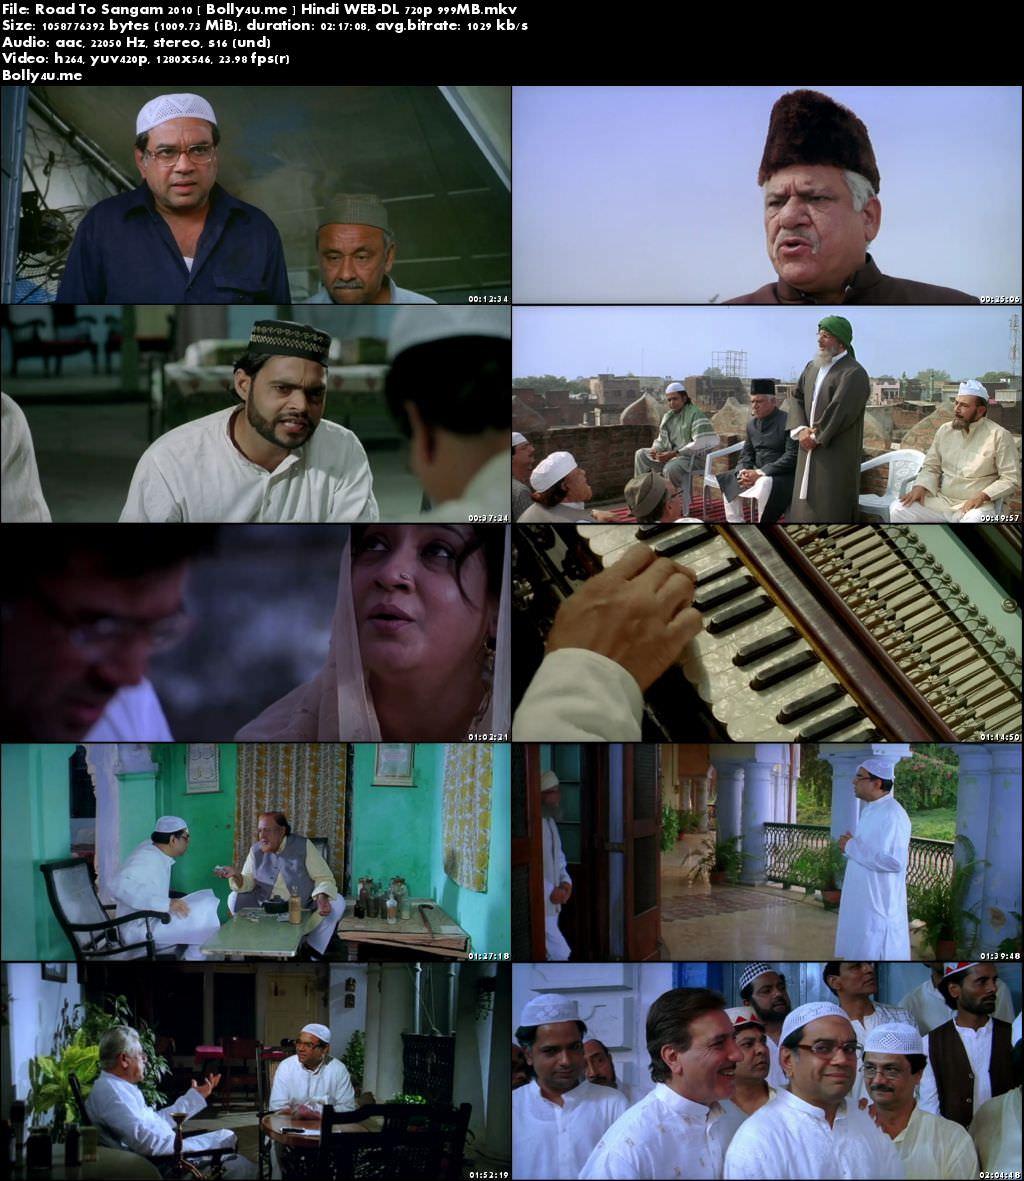 Road To Sangam 2010 WEB-DL 999MB Hindi 720p Download